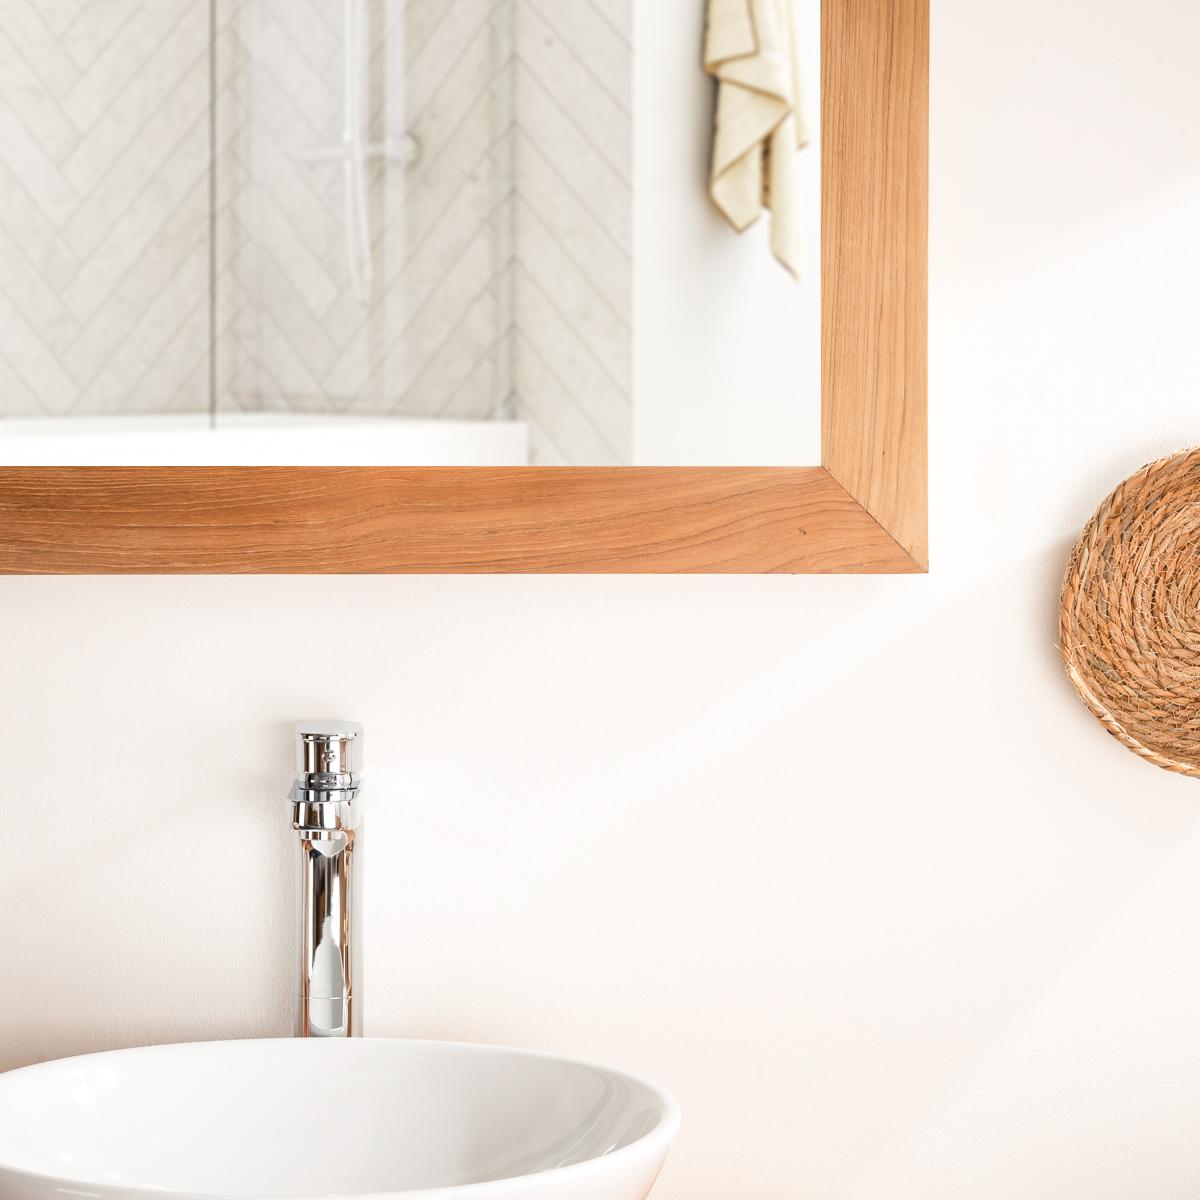 grand miroir rectangle en teck massif 160 x 70. Black Bedroom Furniture Sets. Home Design Ideas